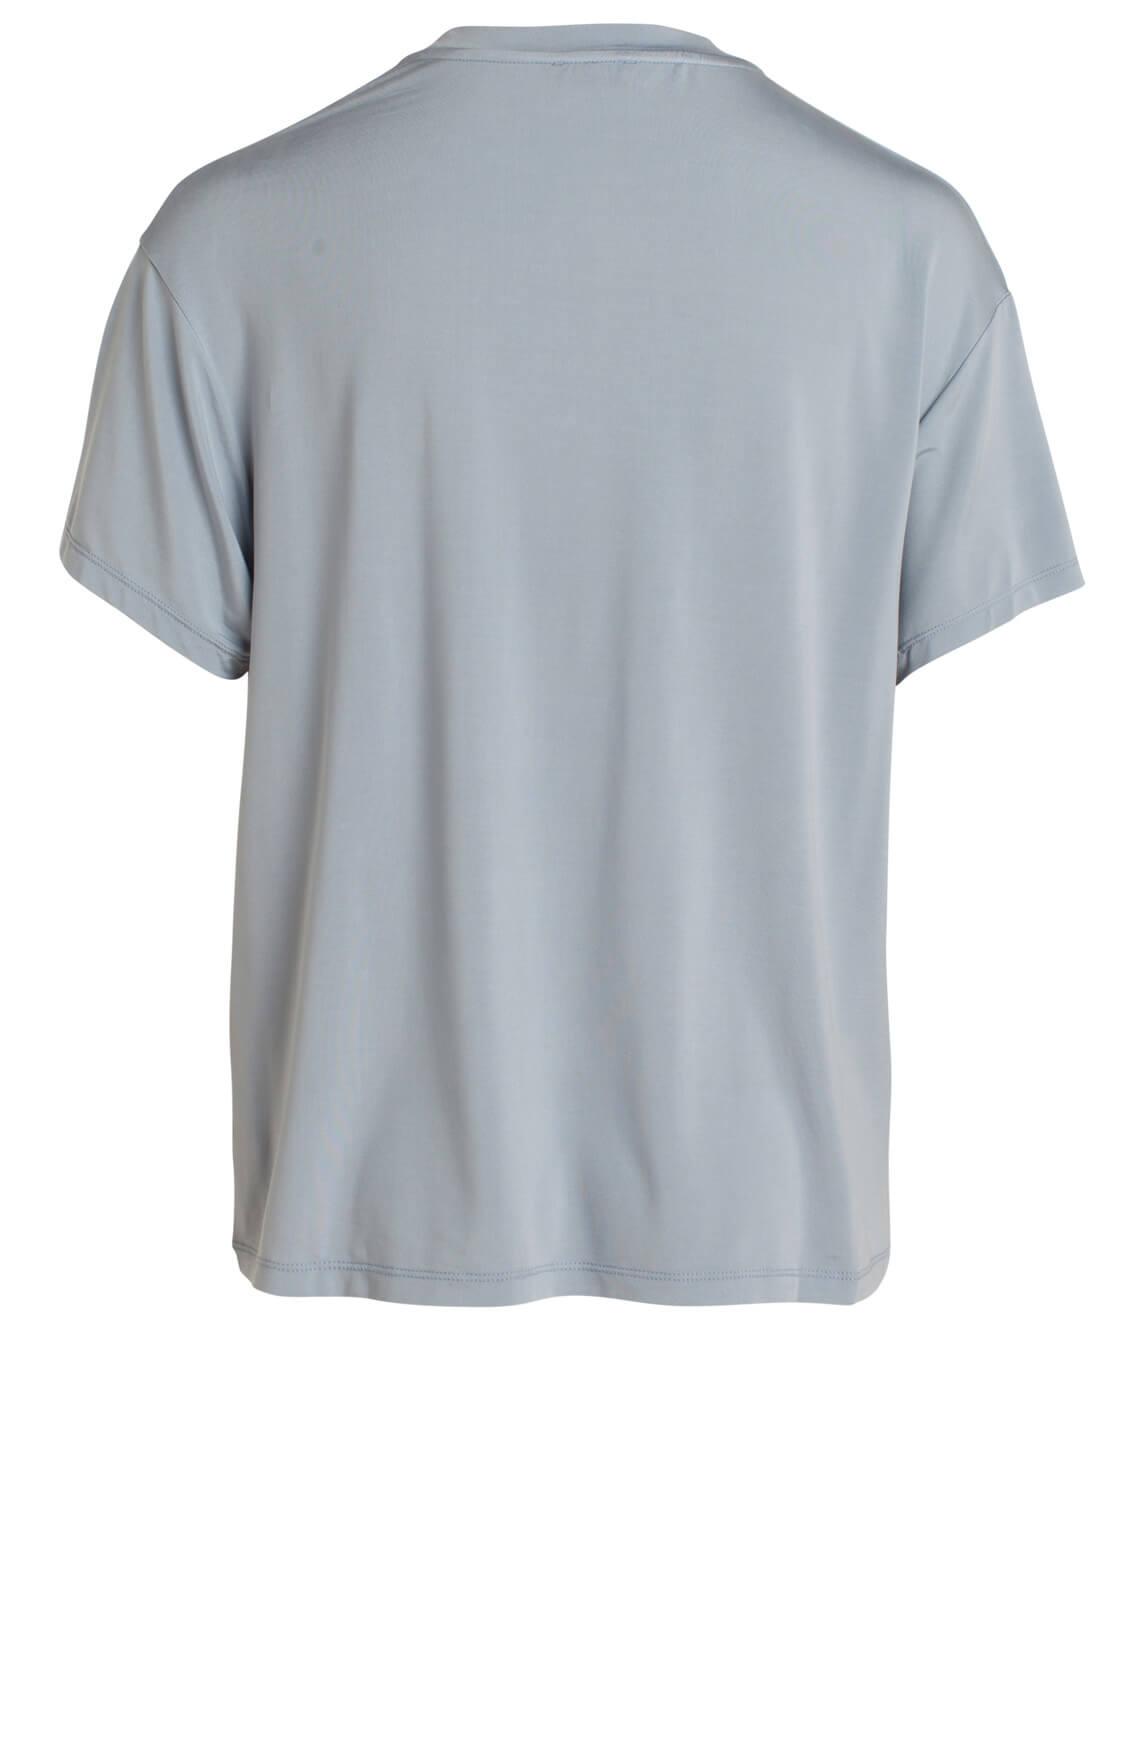 Drykorn Dames Kyla shirt blauw Blauw